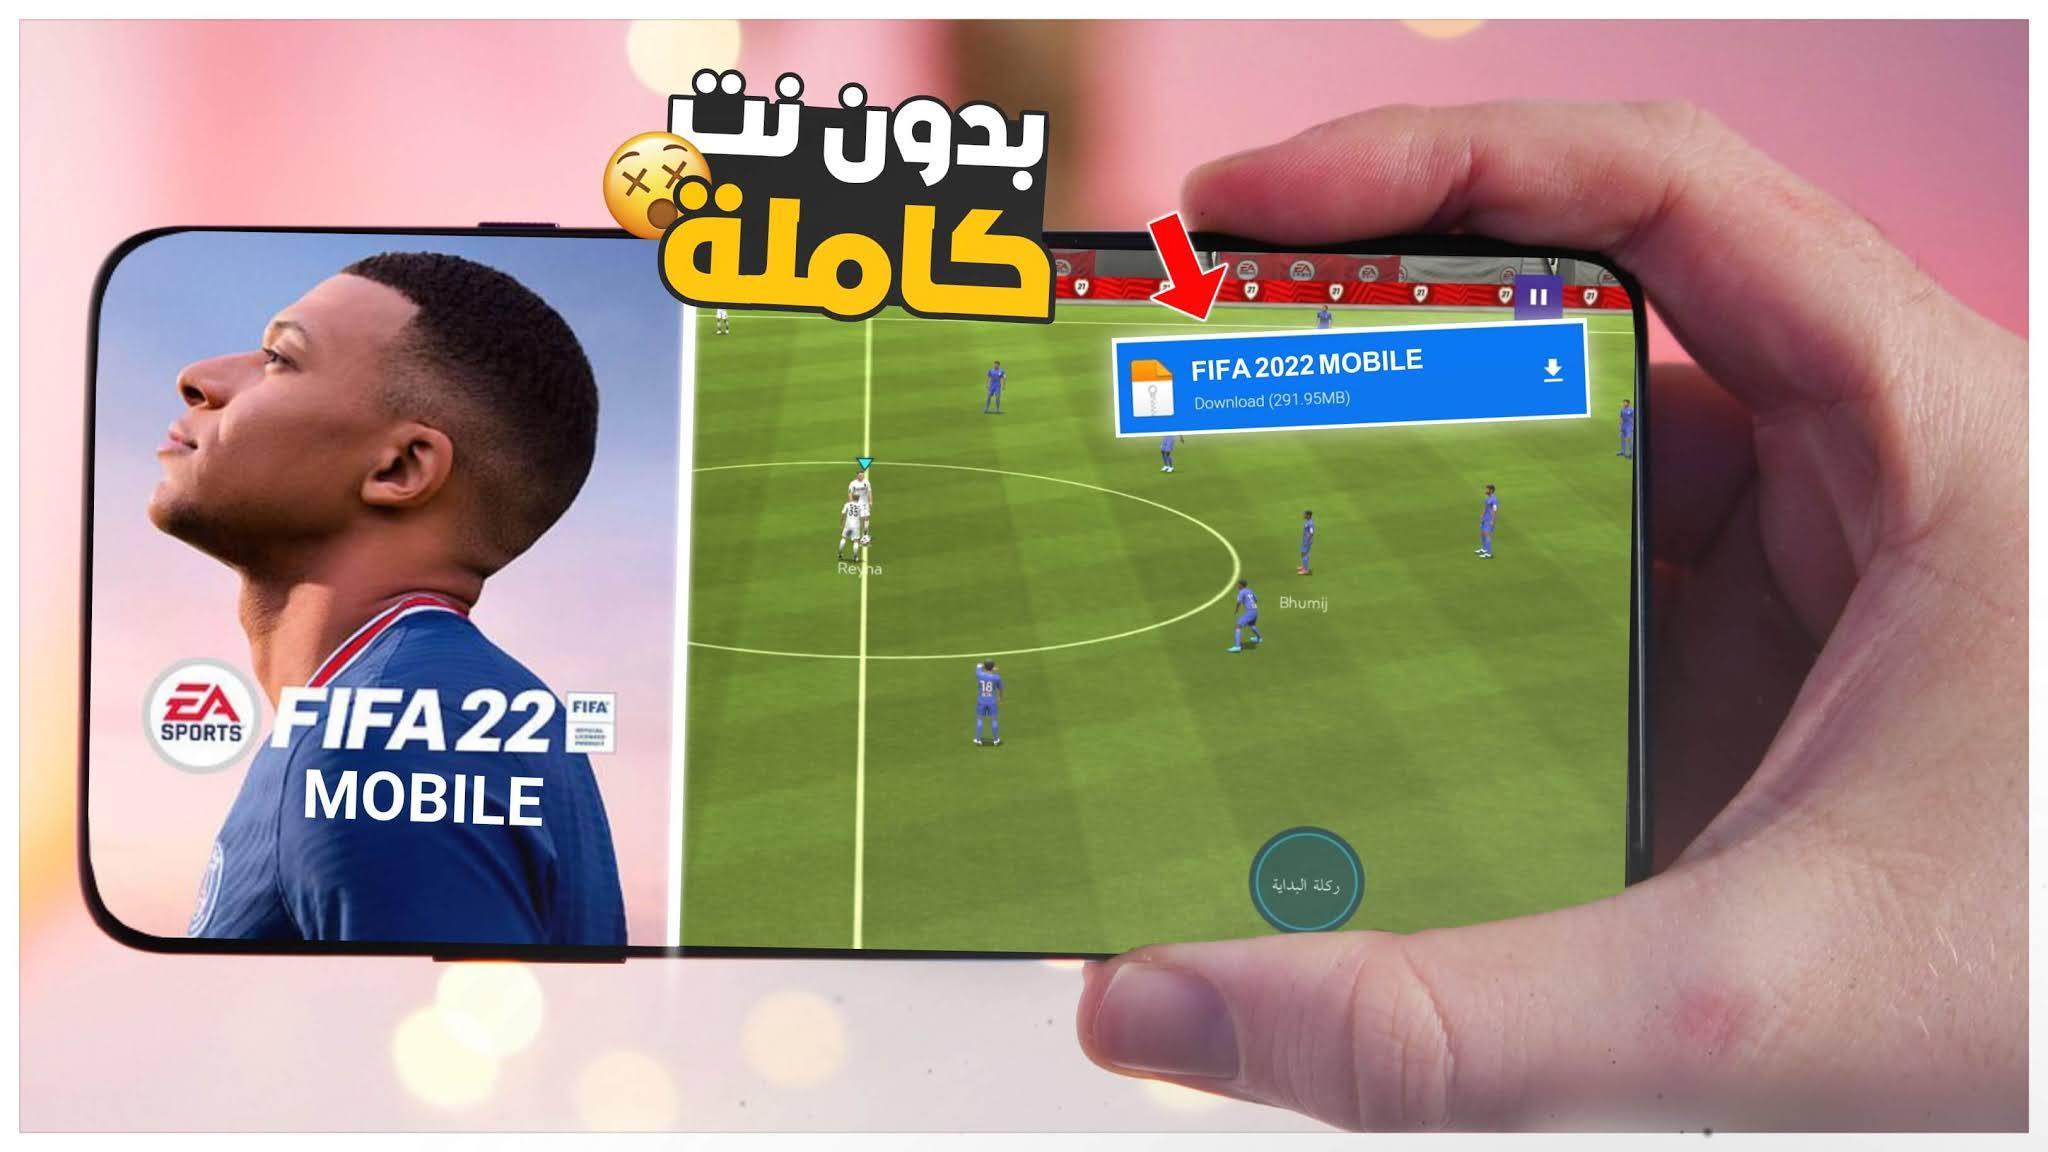 تحميل لعبة FIFA 22 Mobile Android Offline للاندرويد من ميديا فاير برابط مباشر   FIFA 2022 Apk + OBB Data